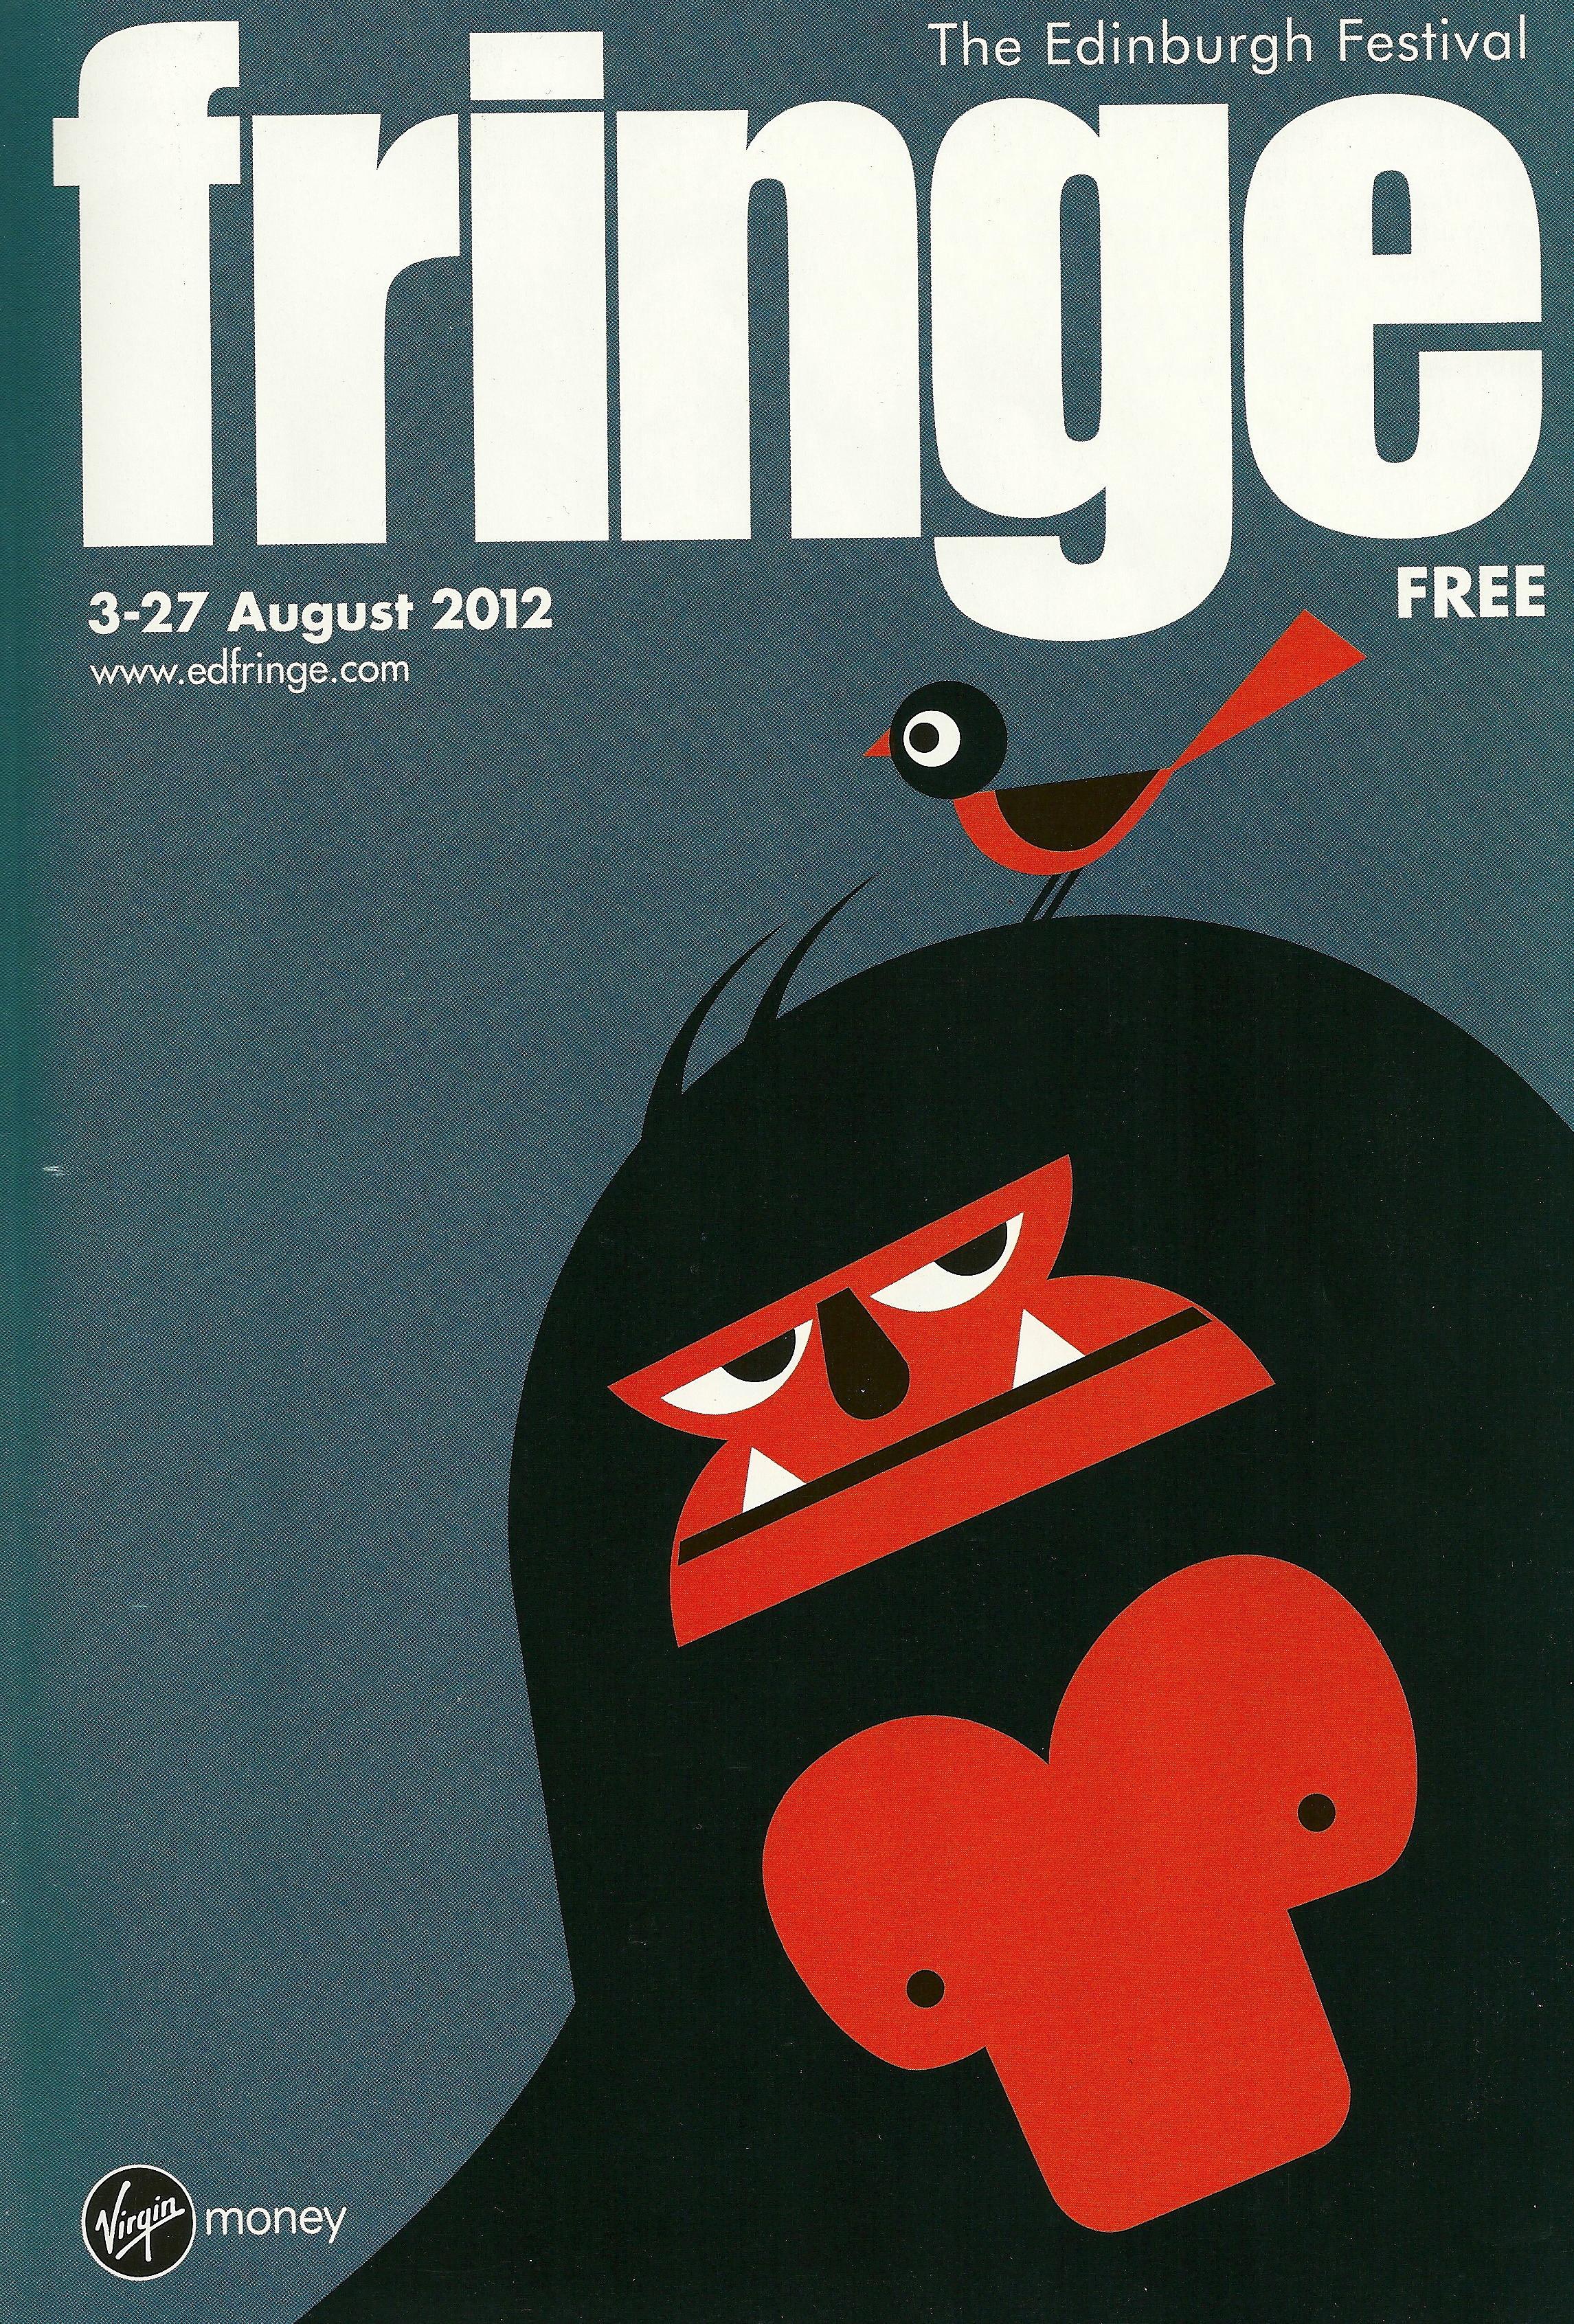 Edinburgh festival fringe 2015 venue guide | features.